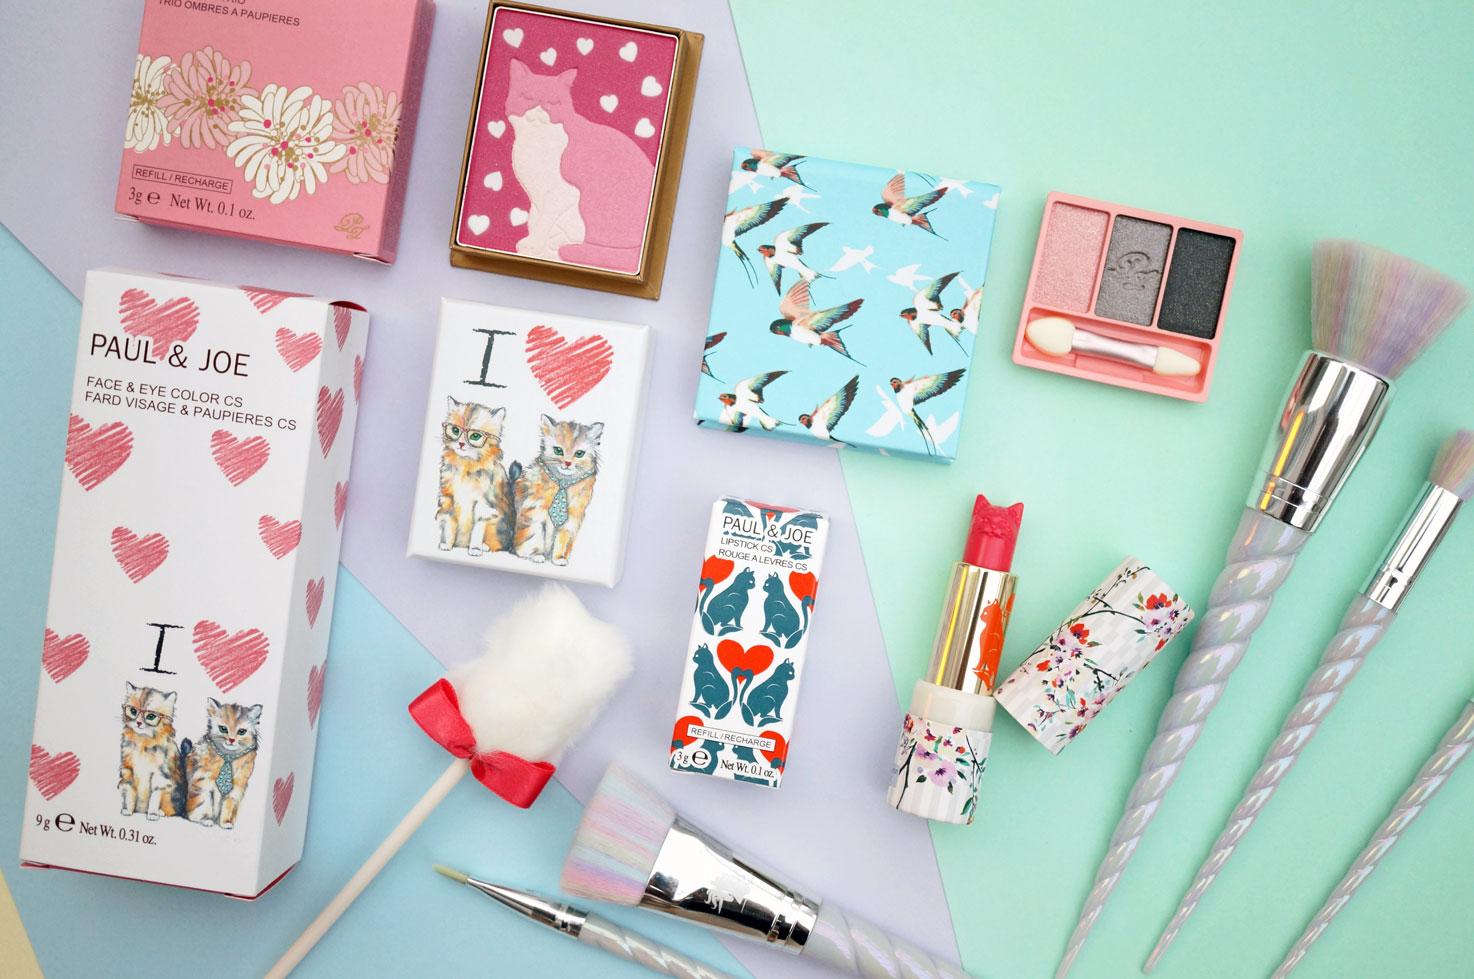 beauty paul joe ss17 limited edition collection thou shalt not covet. Black Bedroom Furniture Sets. Home Design Ideas